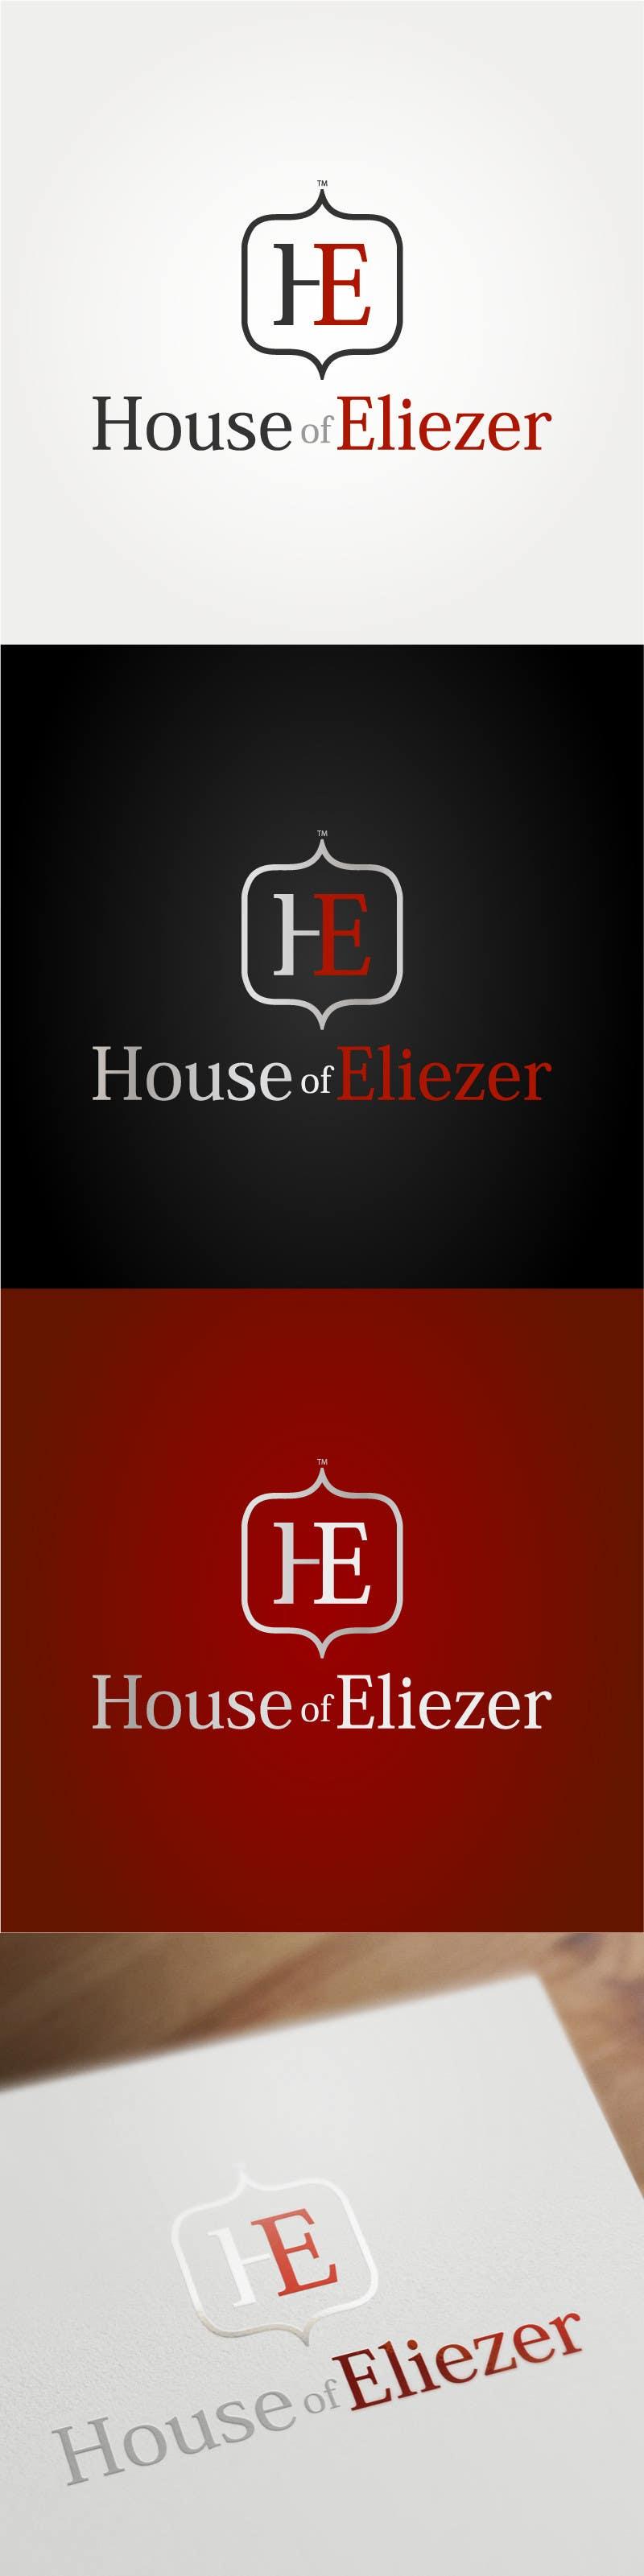 Kilpailutyö #61 kilpailussa Logo Design for House of Eliezer